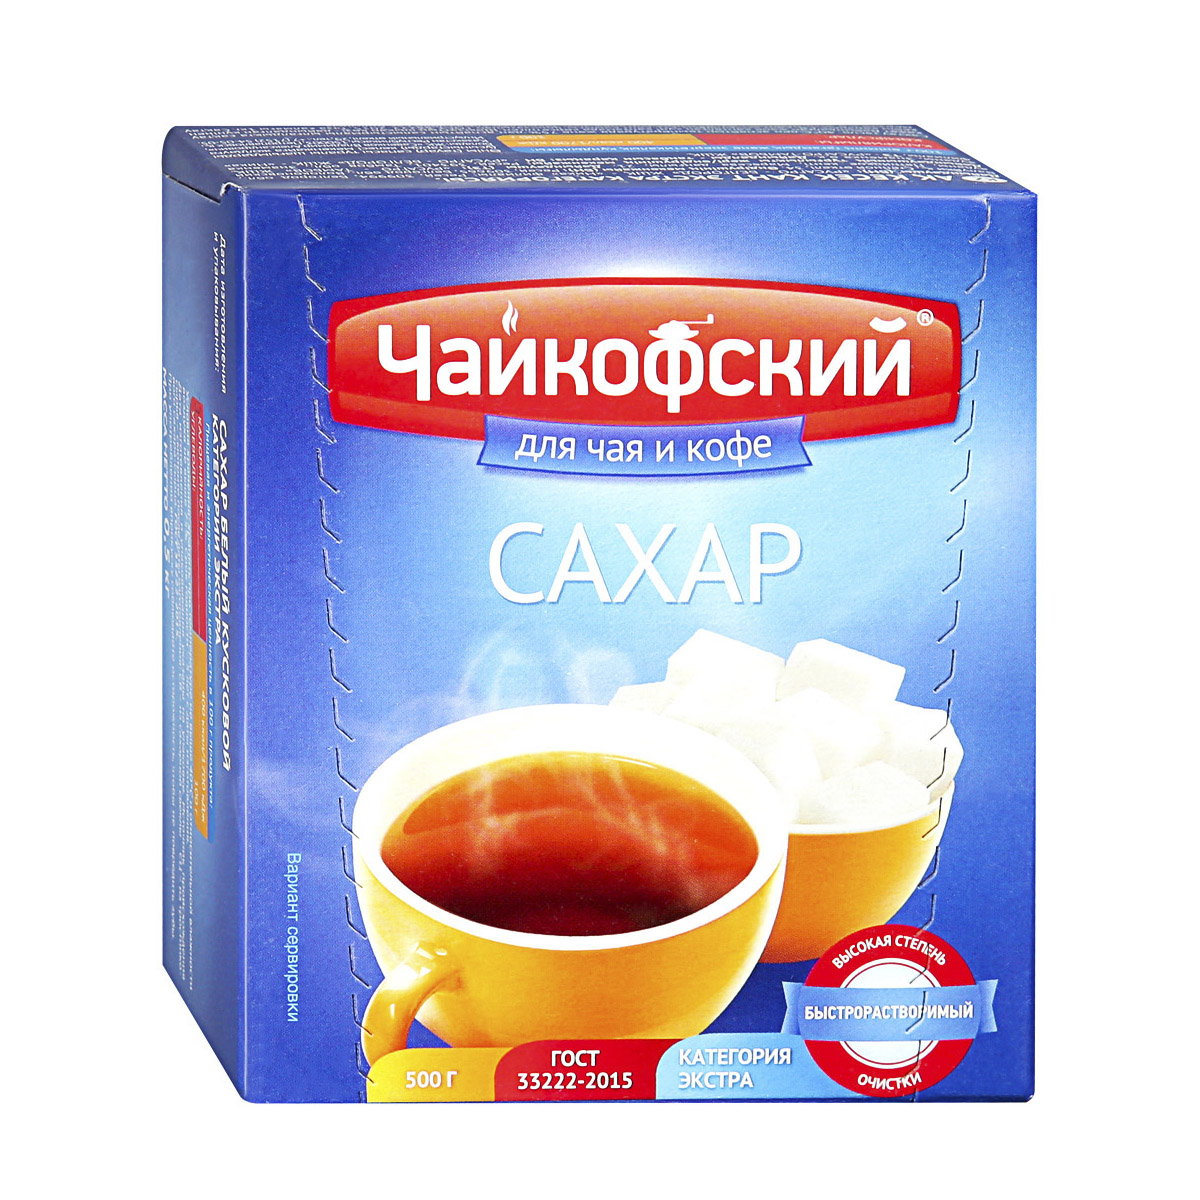 Сахар Чайкофский 500 г